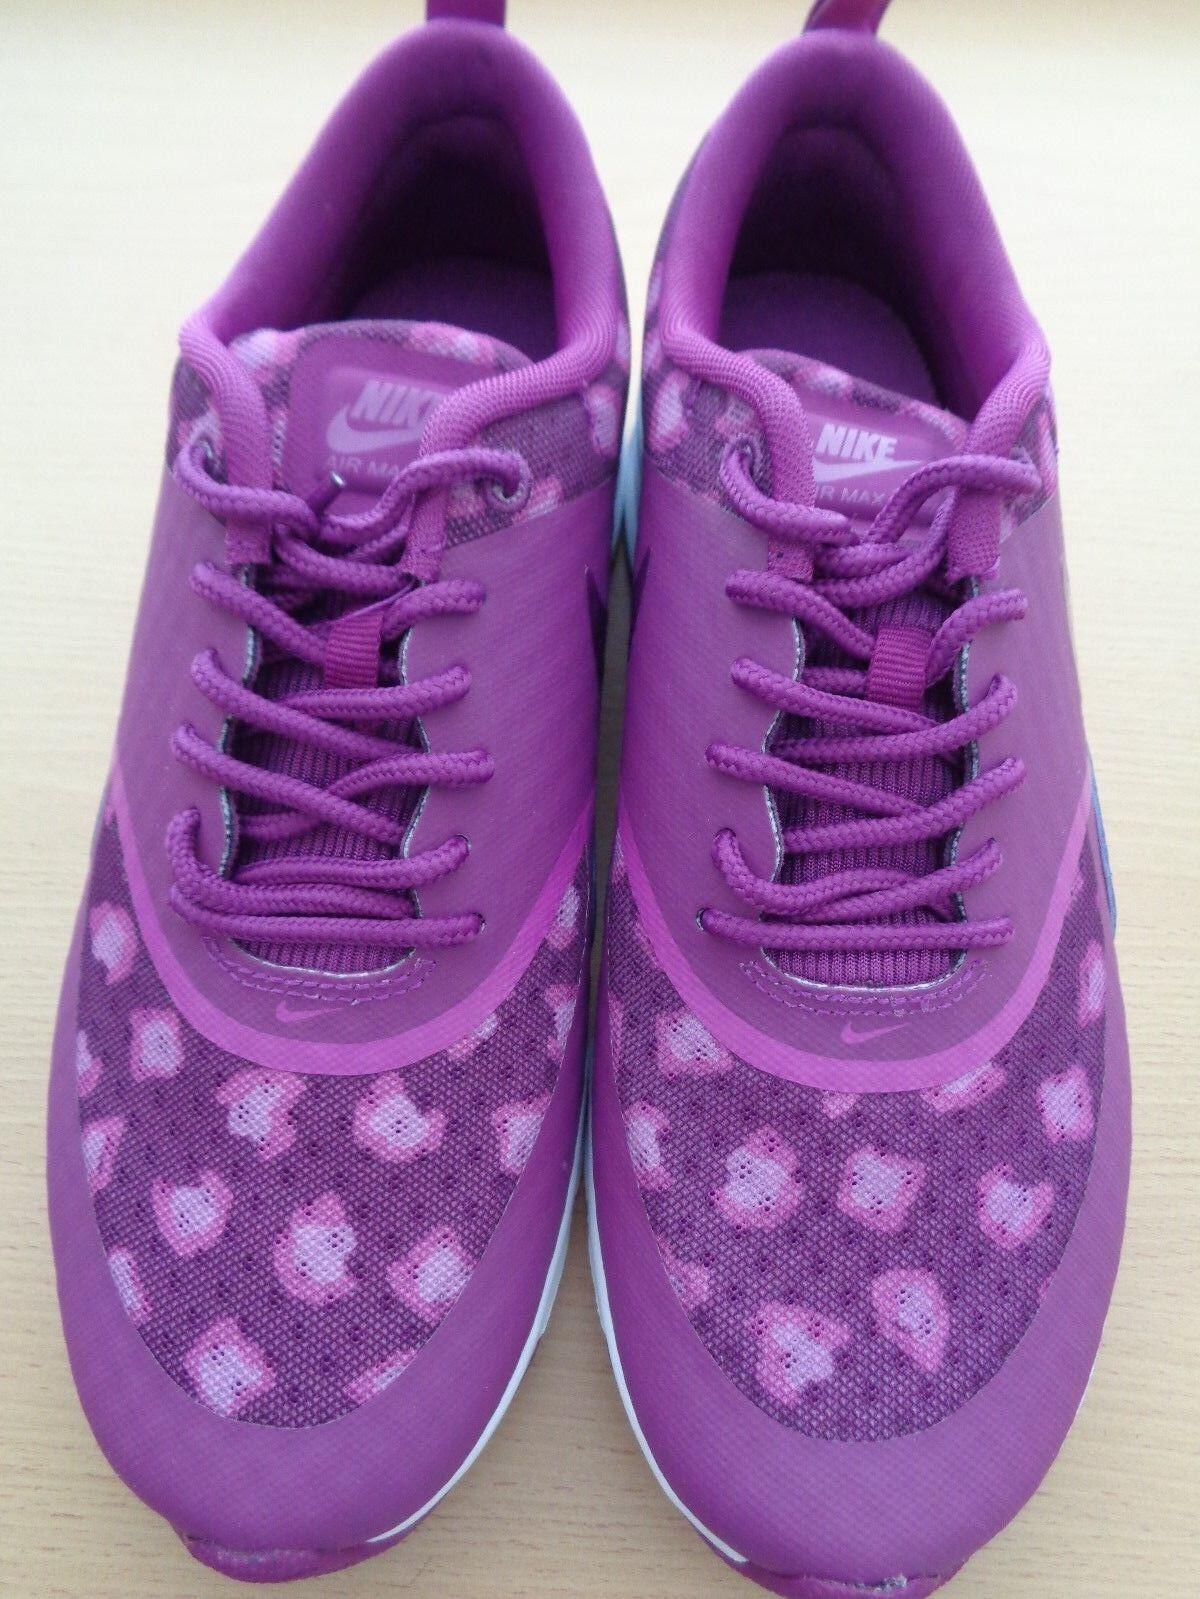 Nike Air Max Thea print womens trainers 599408 37.5 501 uk 4 eu 37.5 599408 us 6.5 NEW+BOX 1f2033